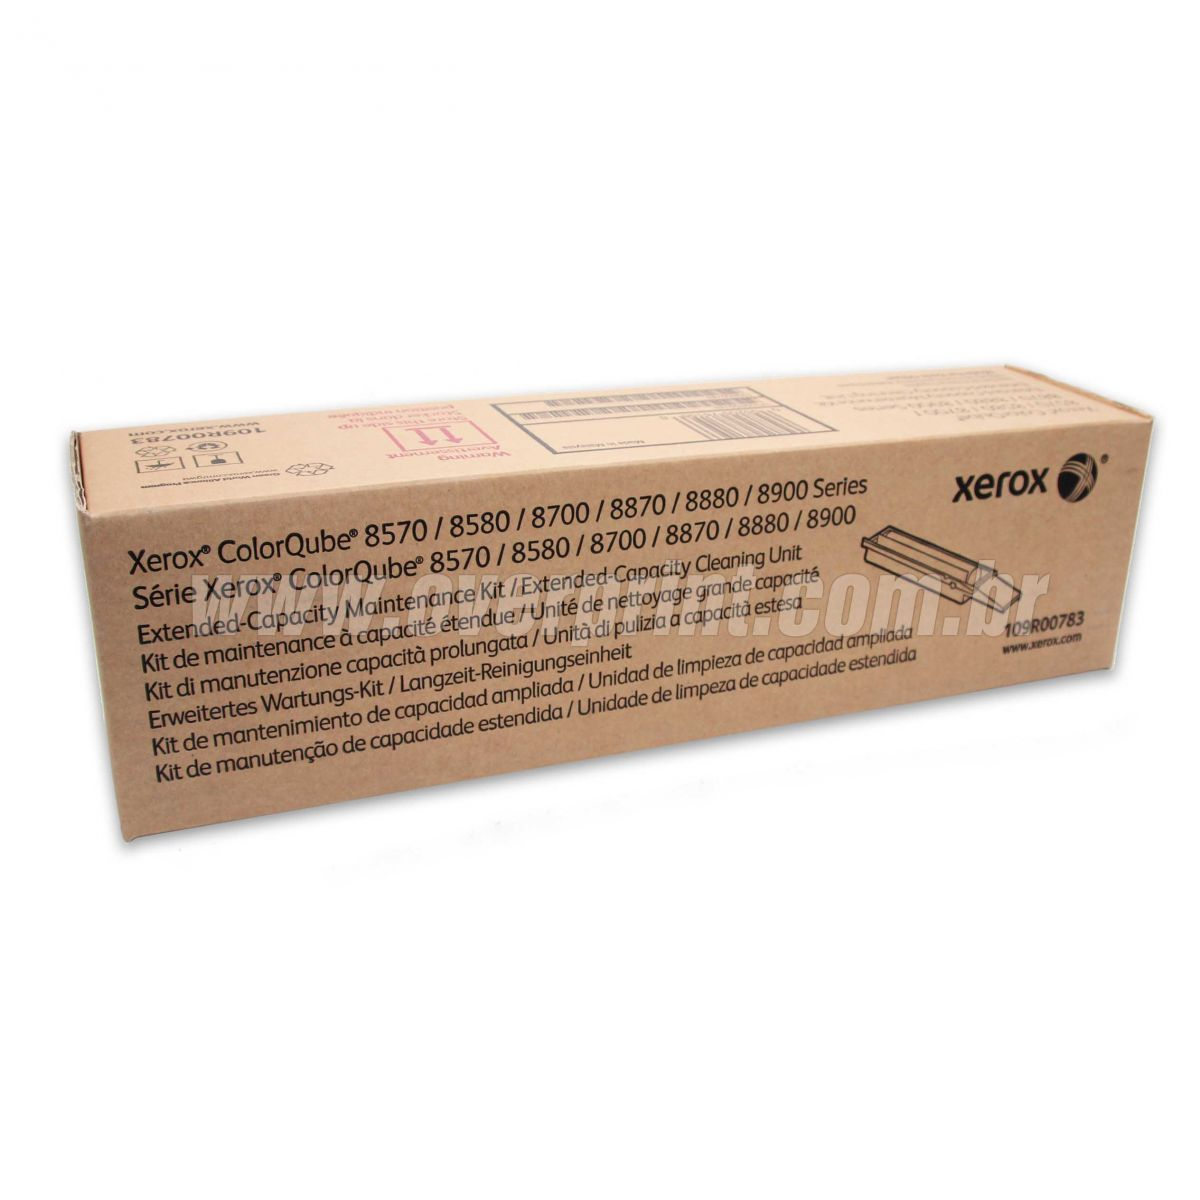 Kit Manutenção Original Xerox Colorqube 8570/8580/8700/8870/8880/8900 - Overprint